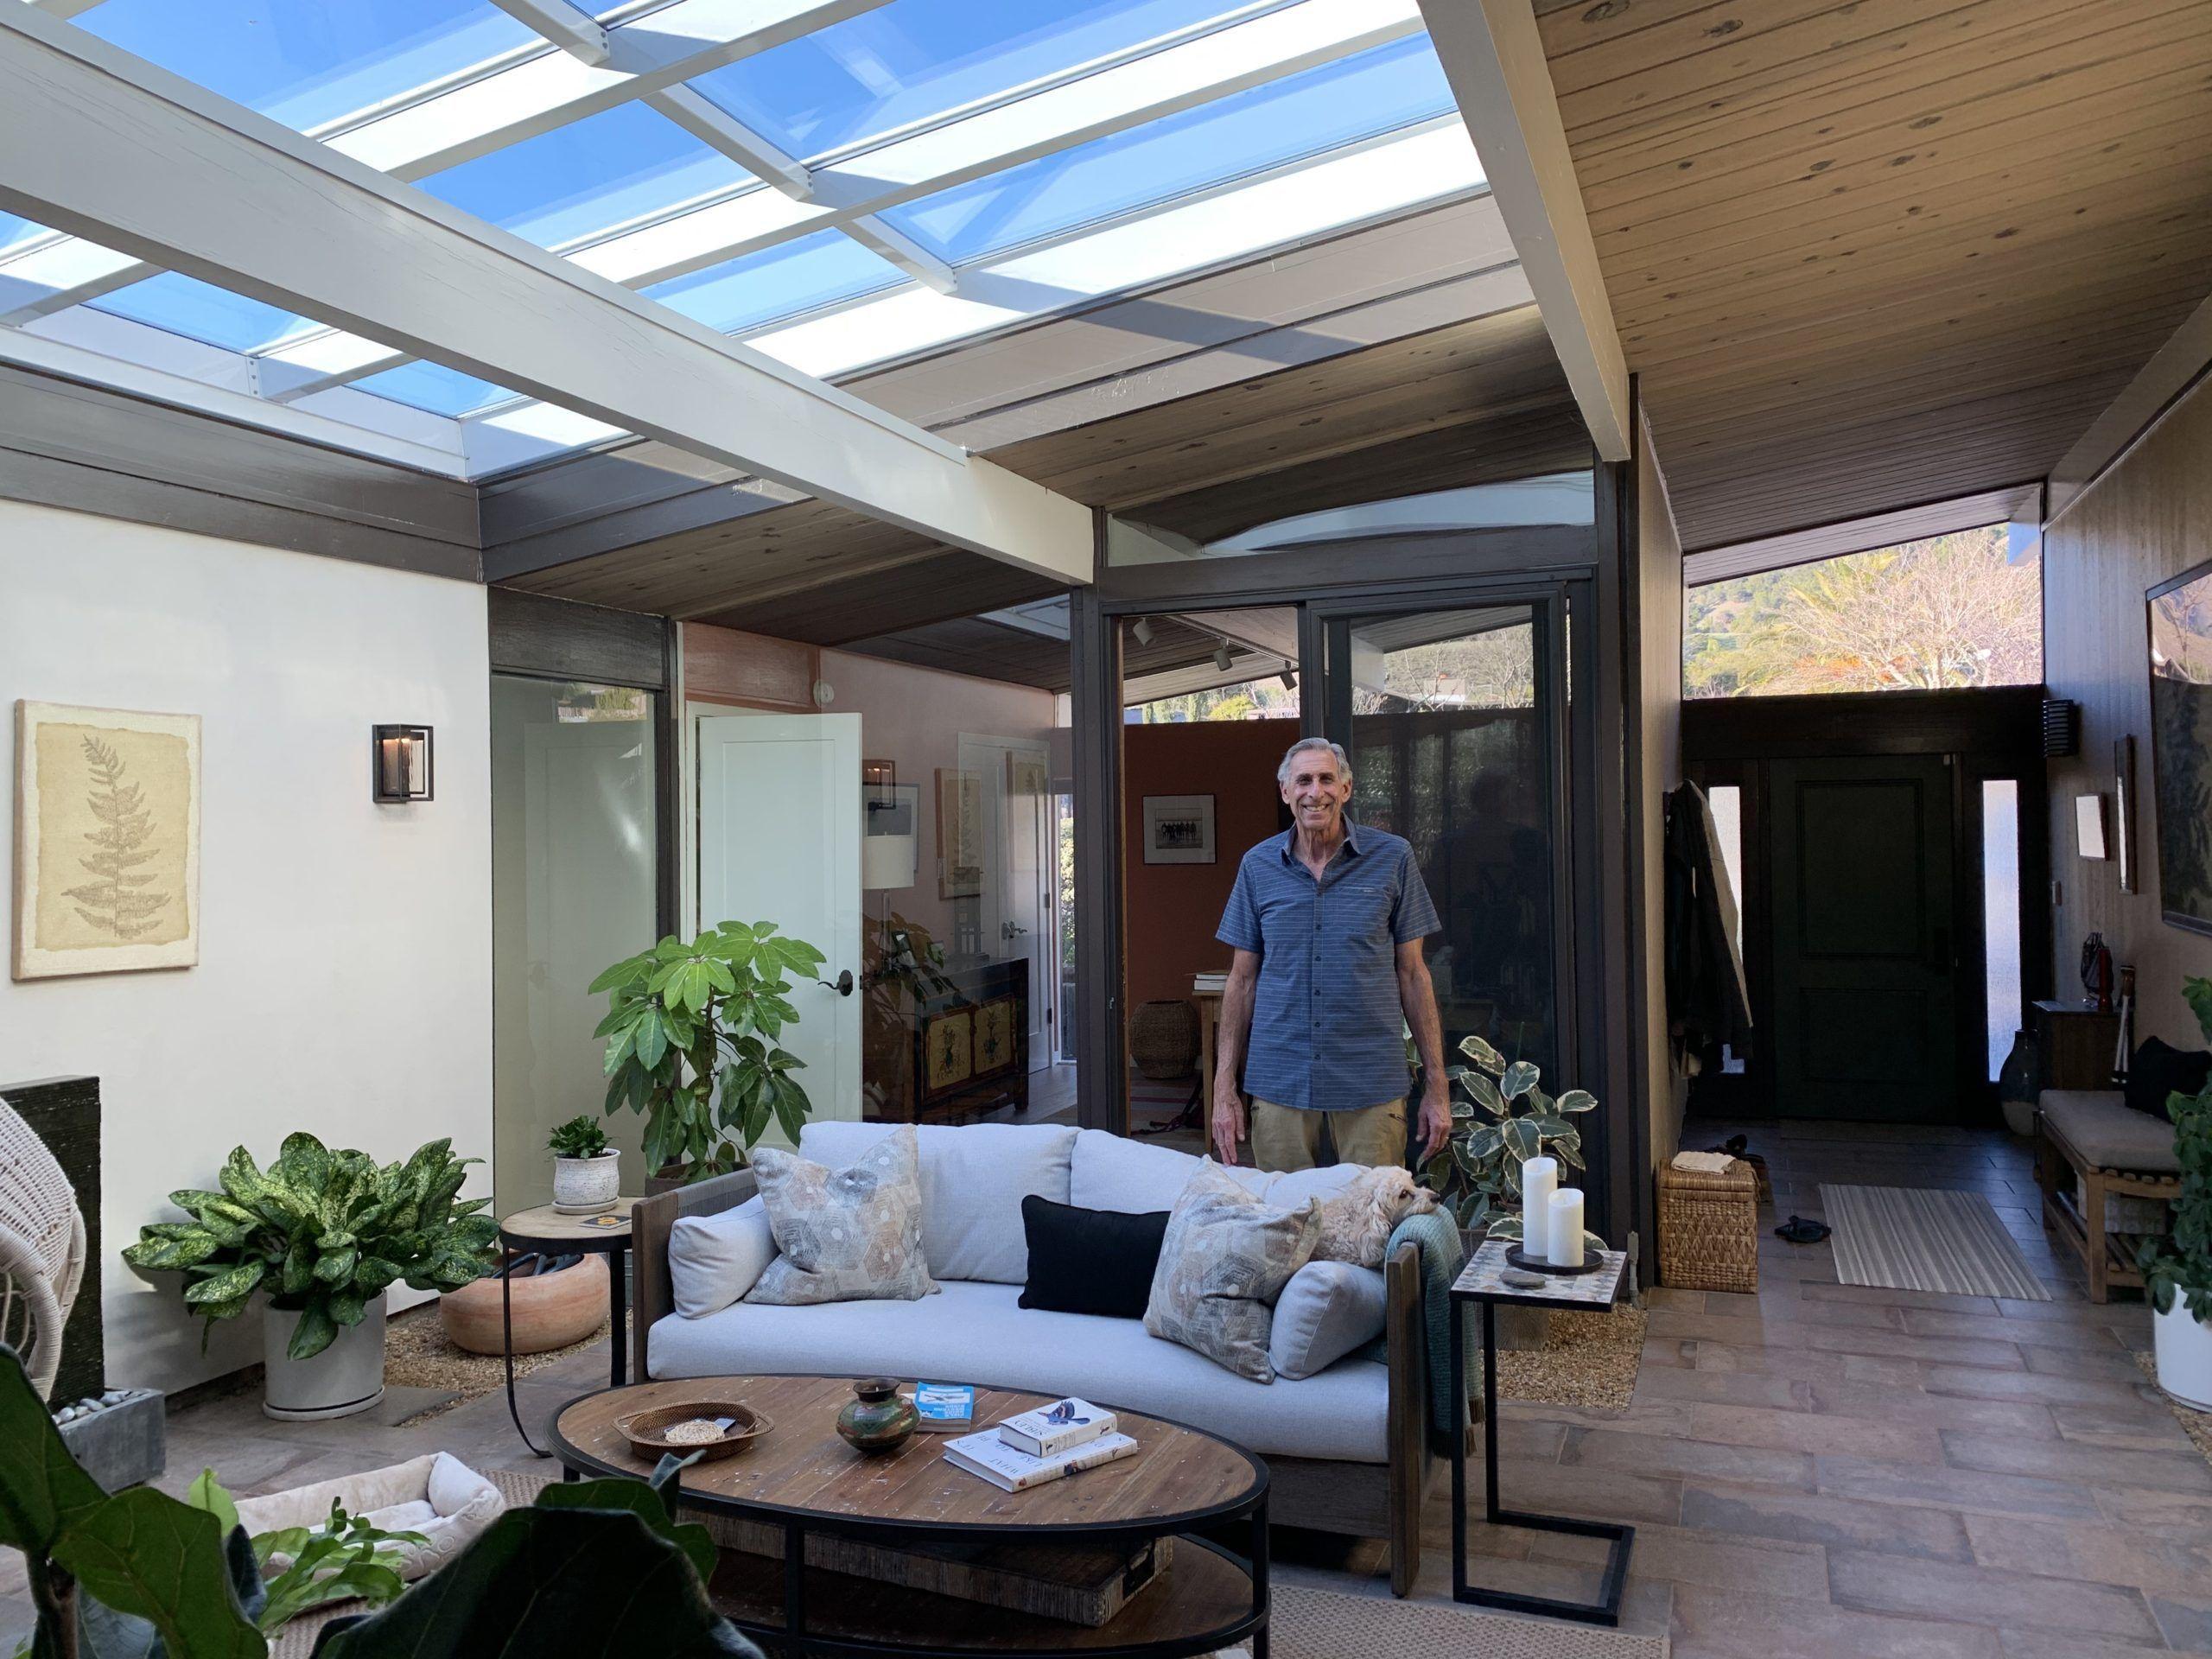 Eichler atrium skylight